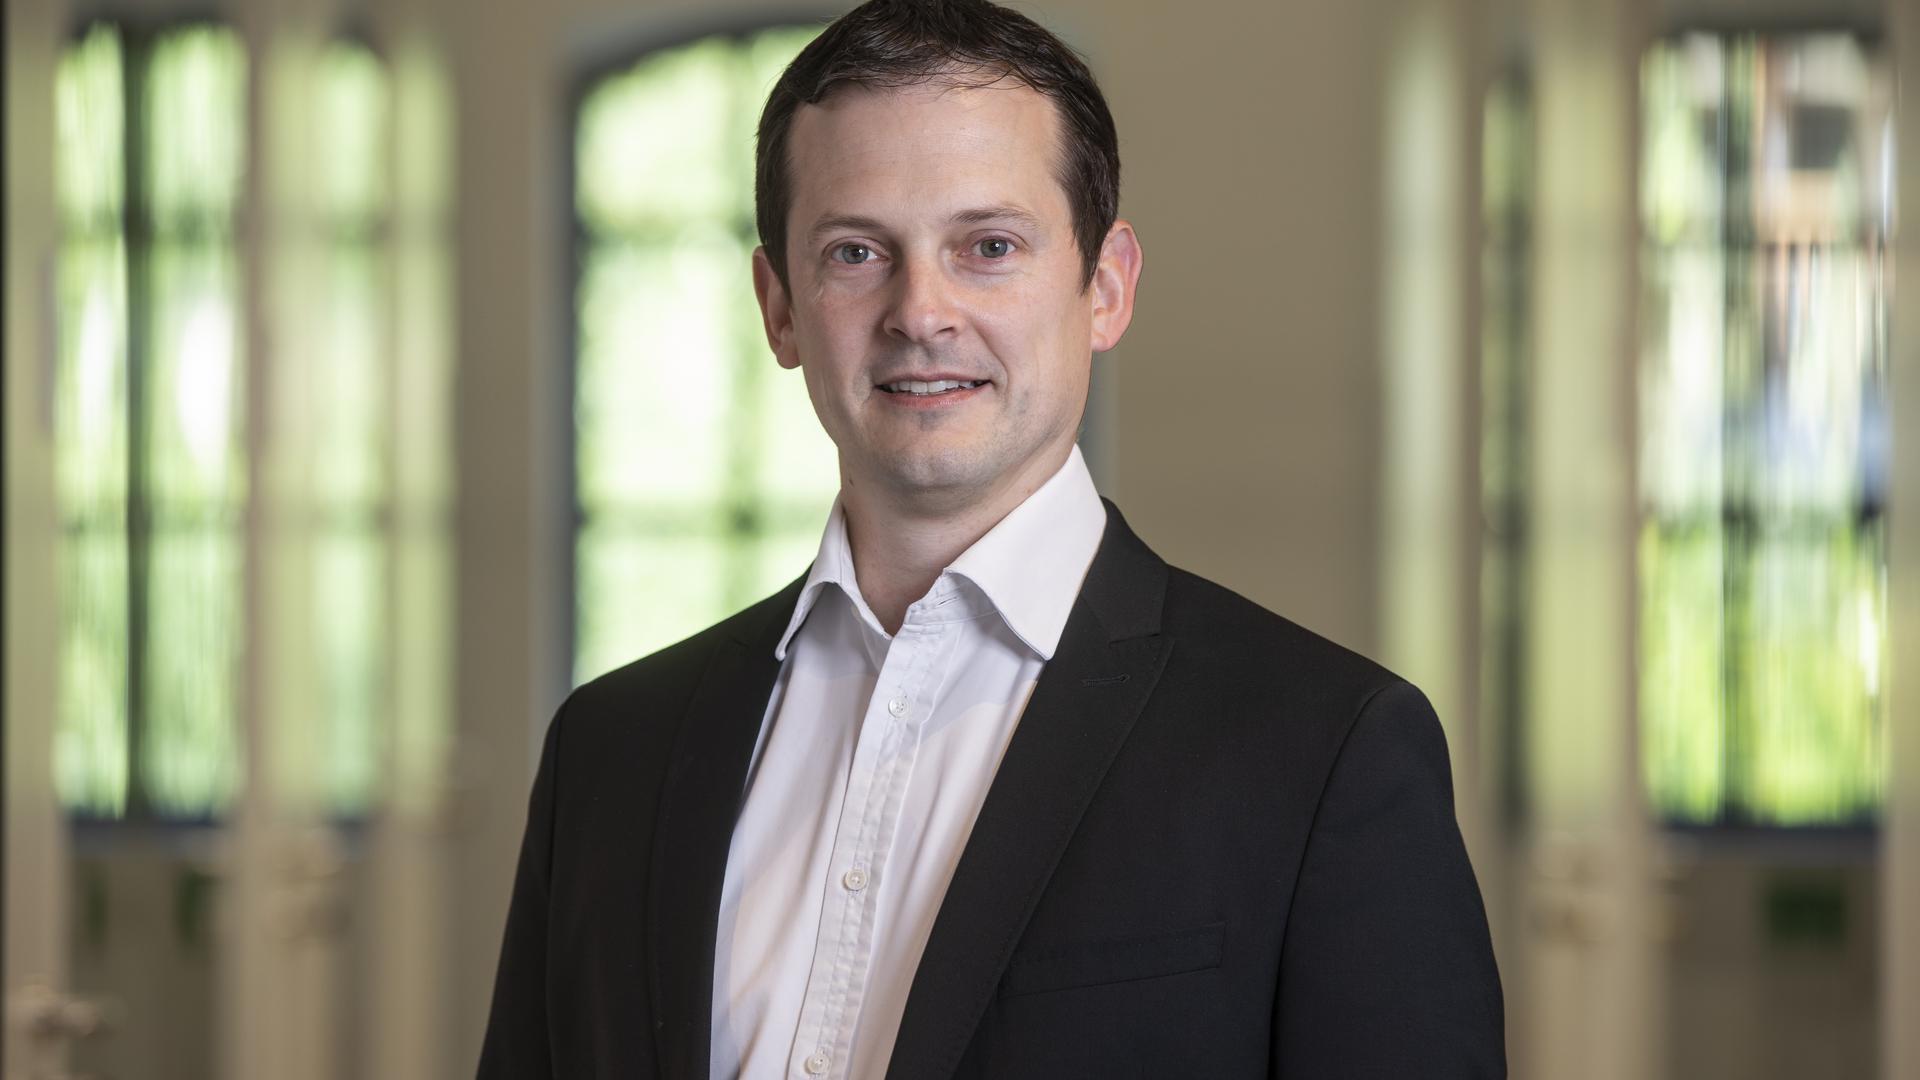 Porträtbild von Bürgermeister Christian Huber